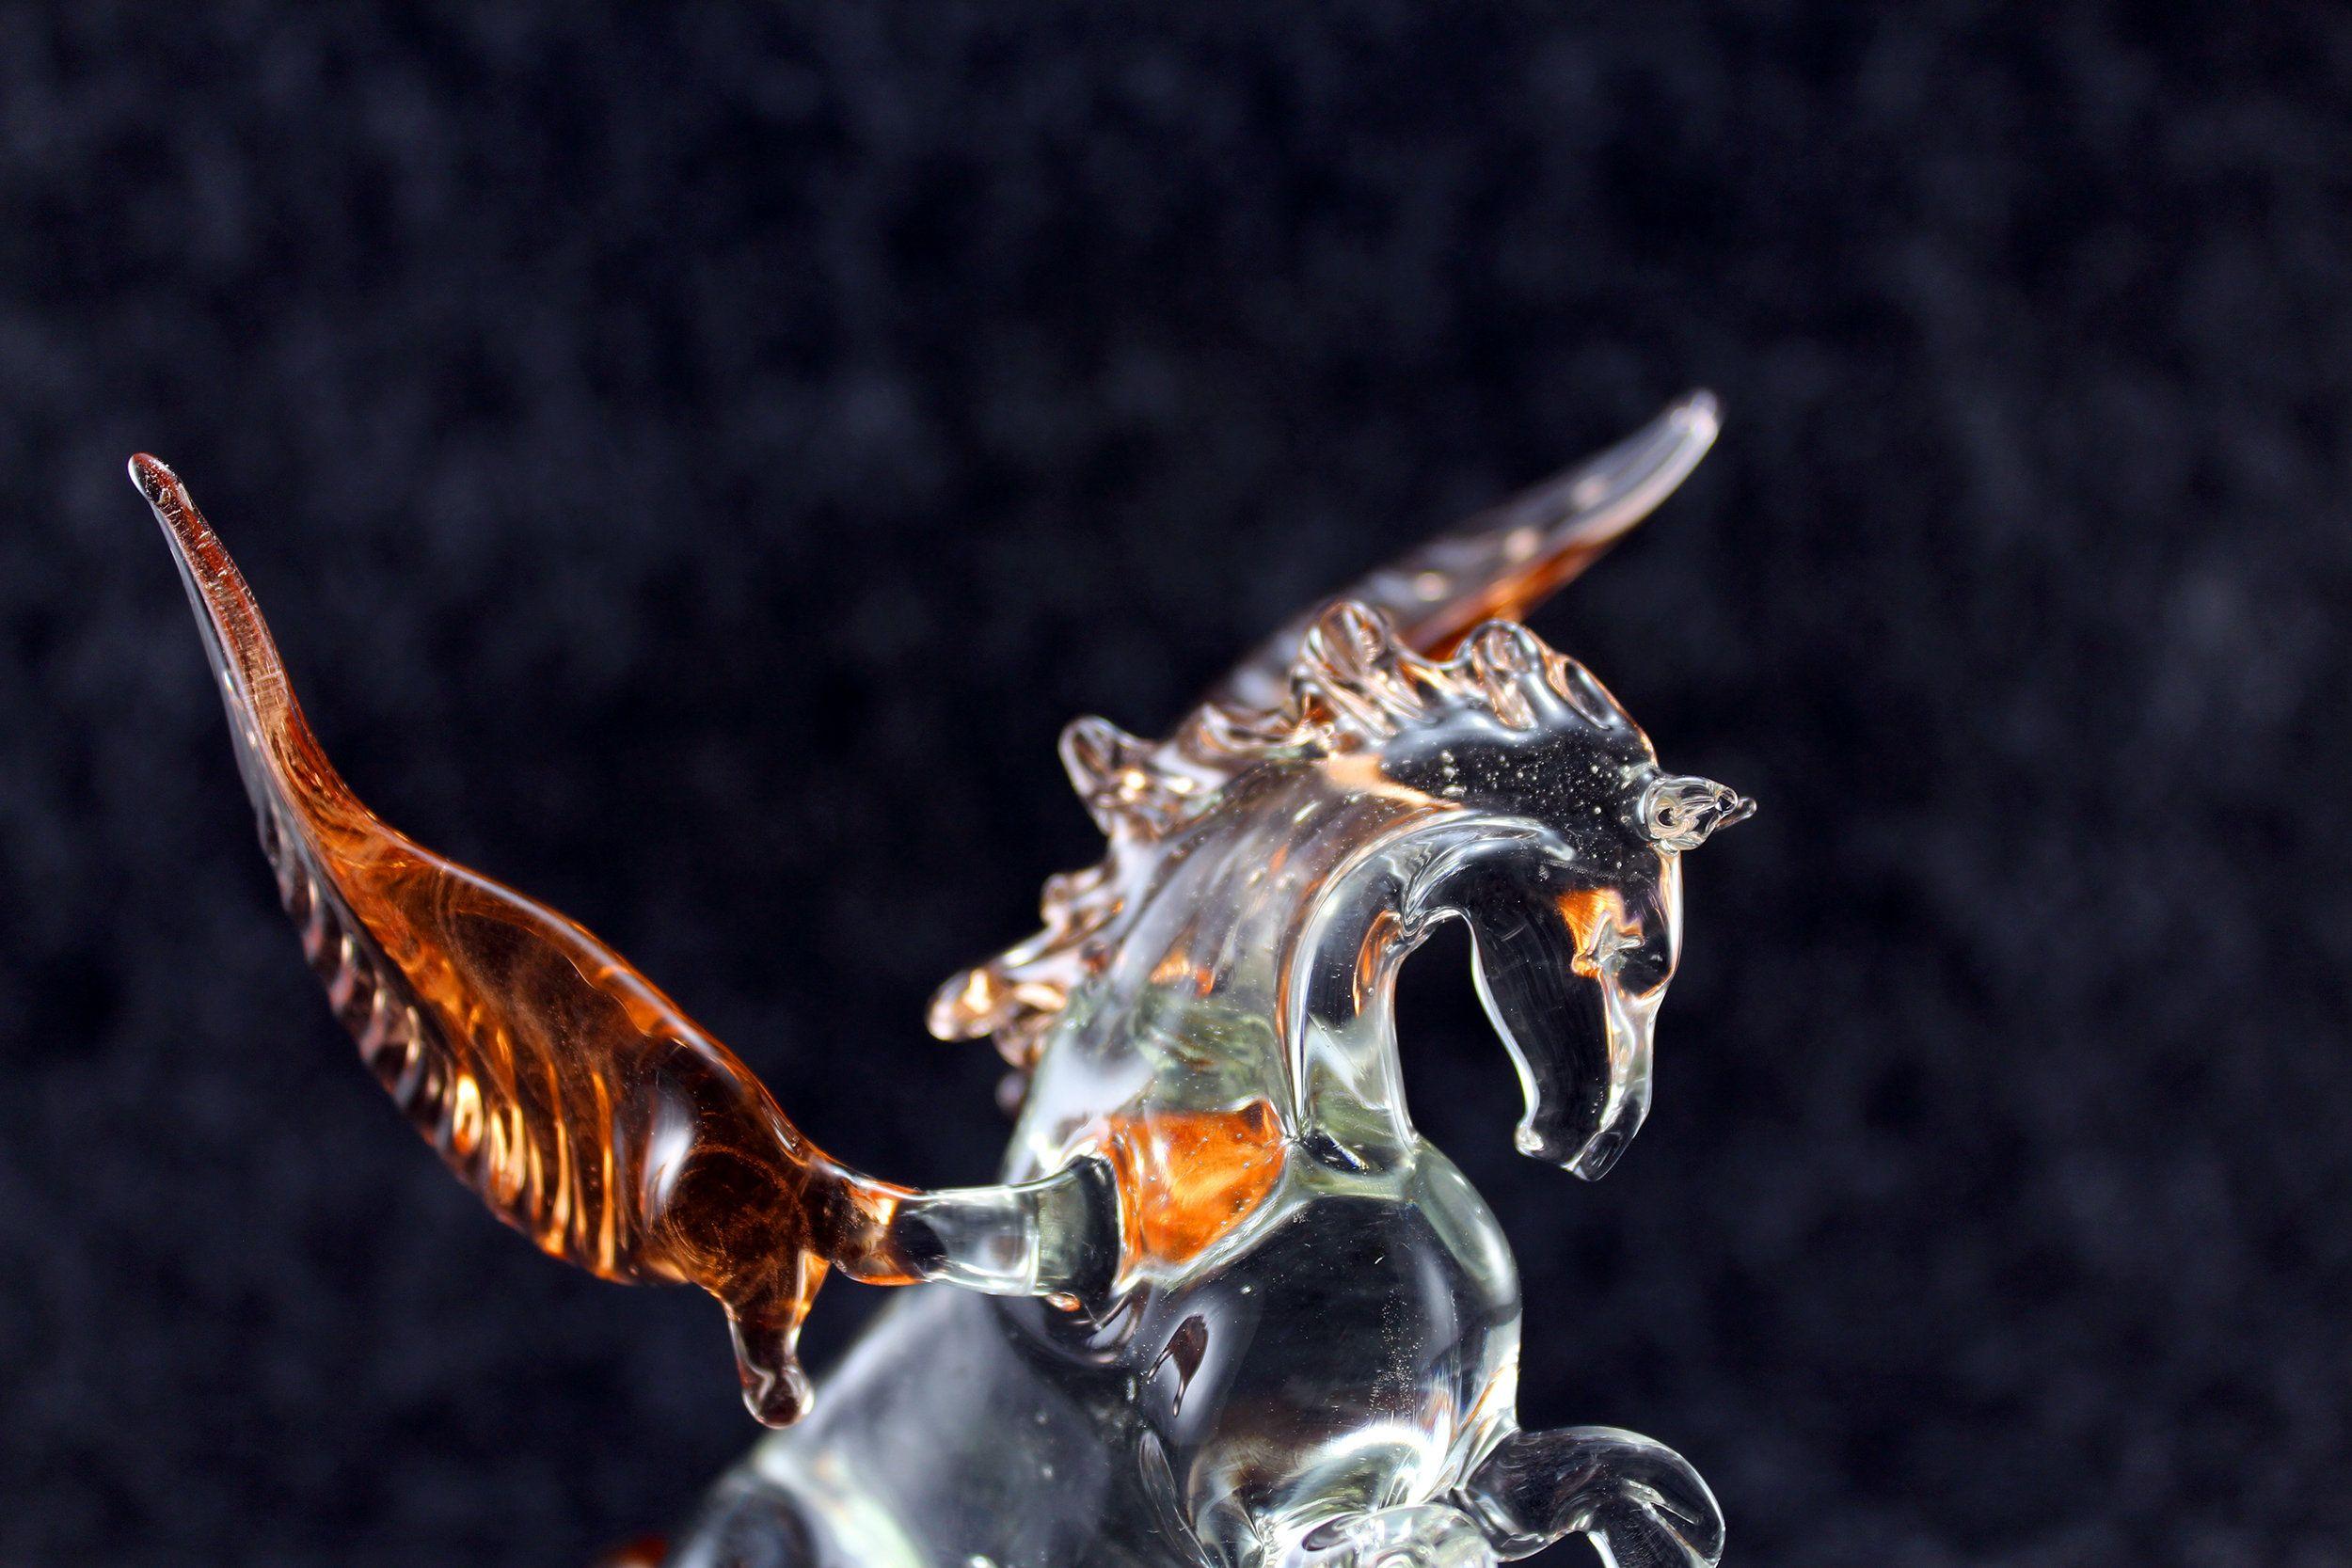 Glass Pegasus Figurine Glass Figurine Horse Figurine Etsy Glass Figurines Horse Figurine Glass Animals